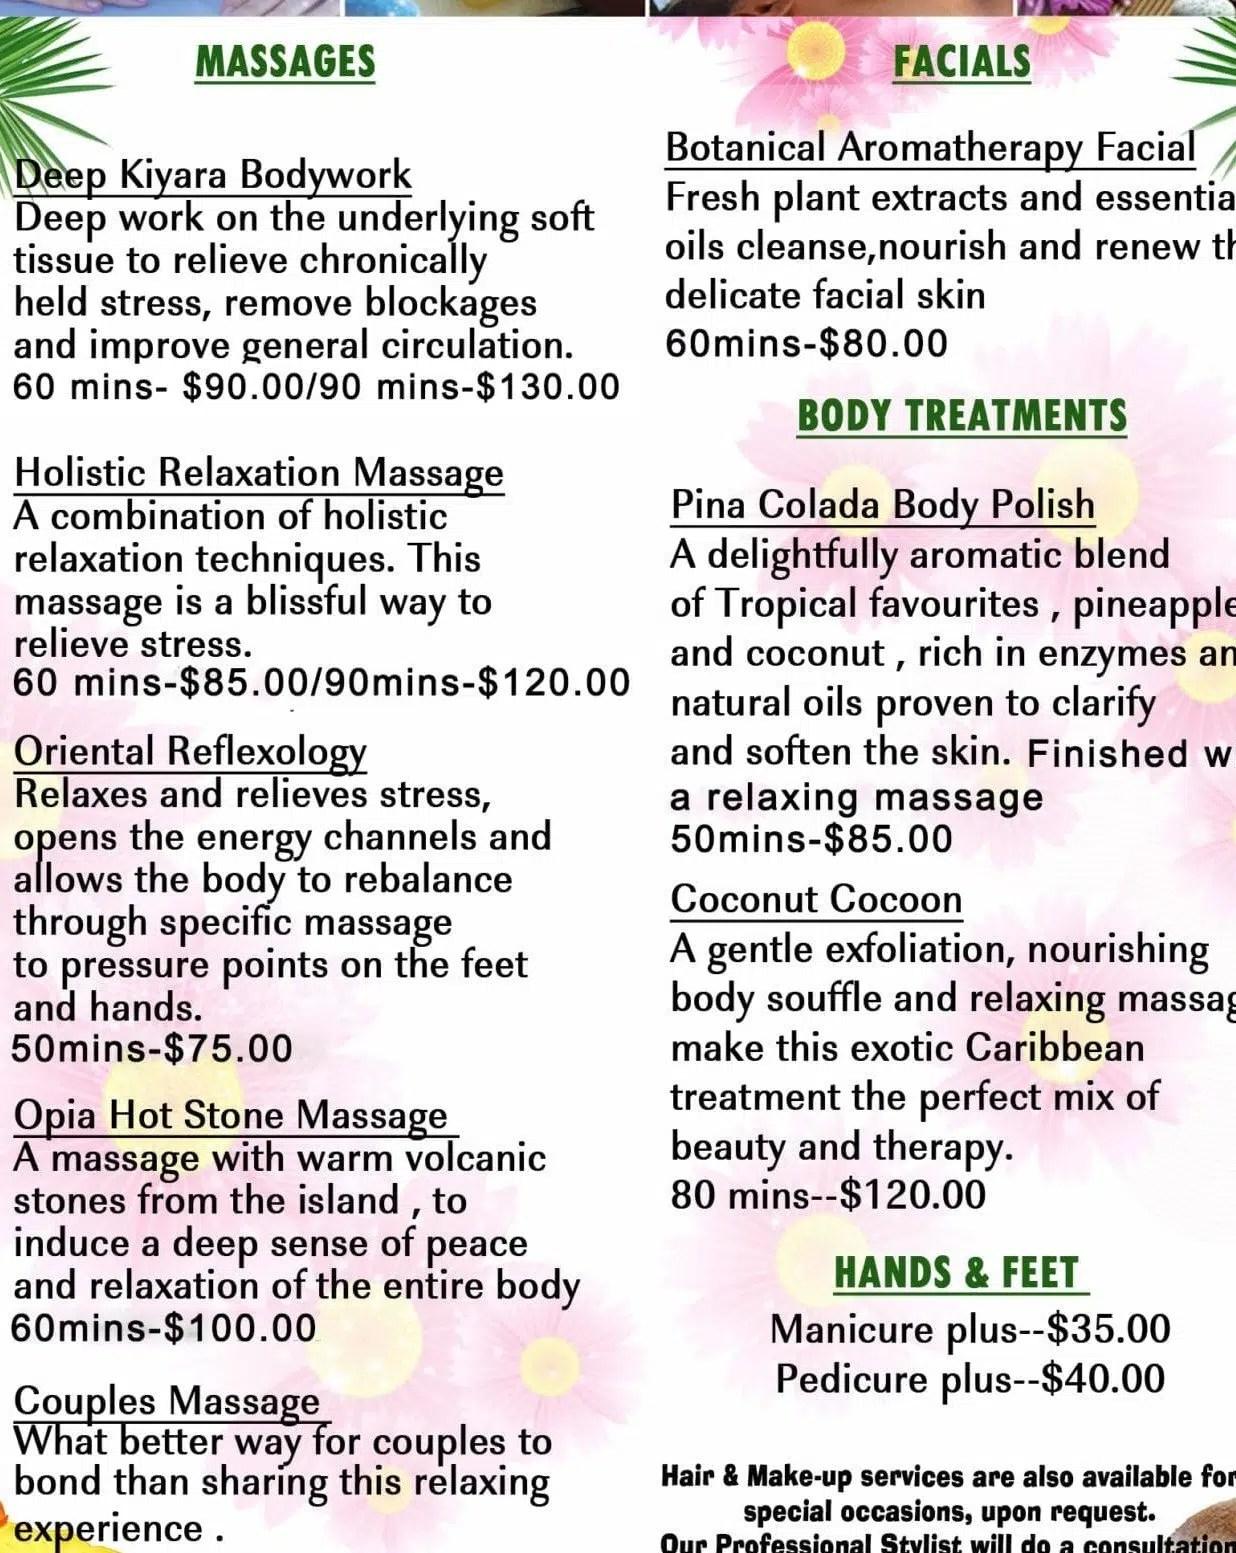 Jamaica villa offer spa services